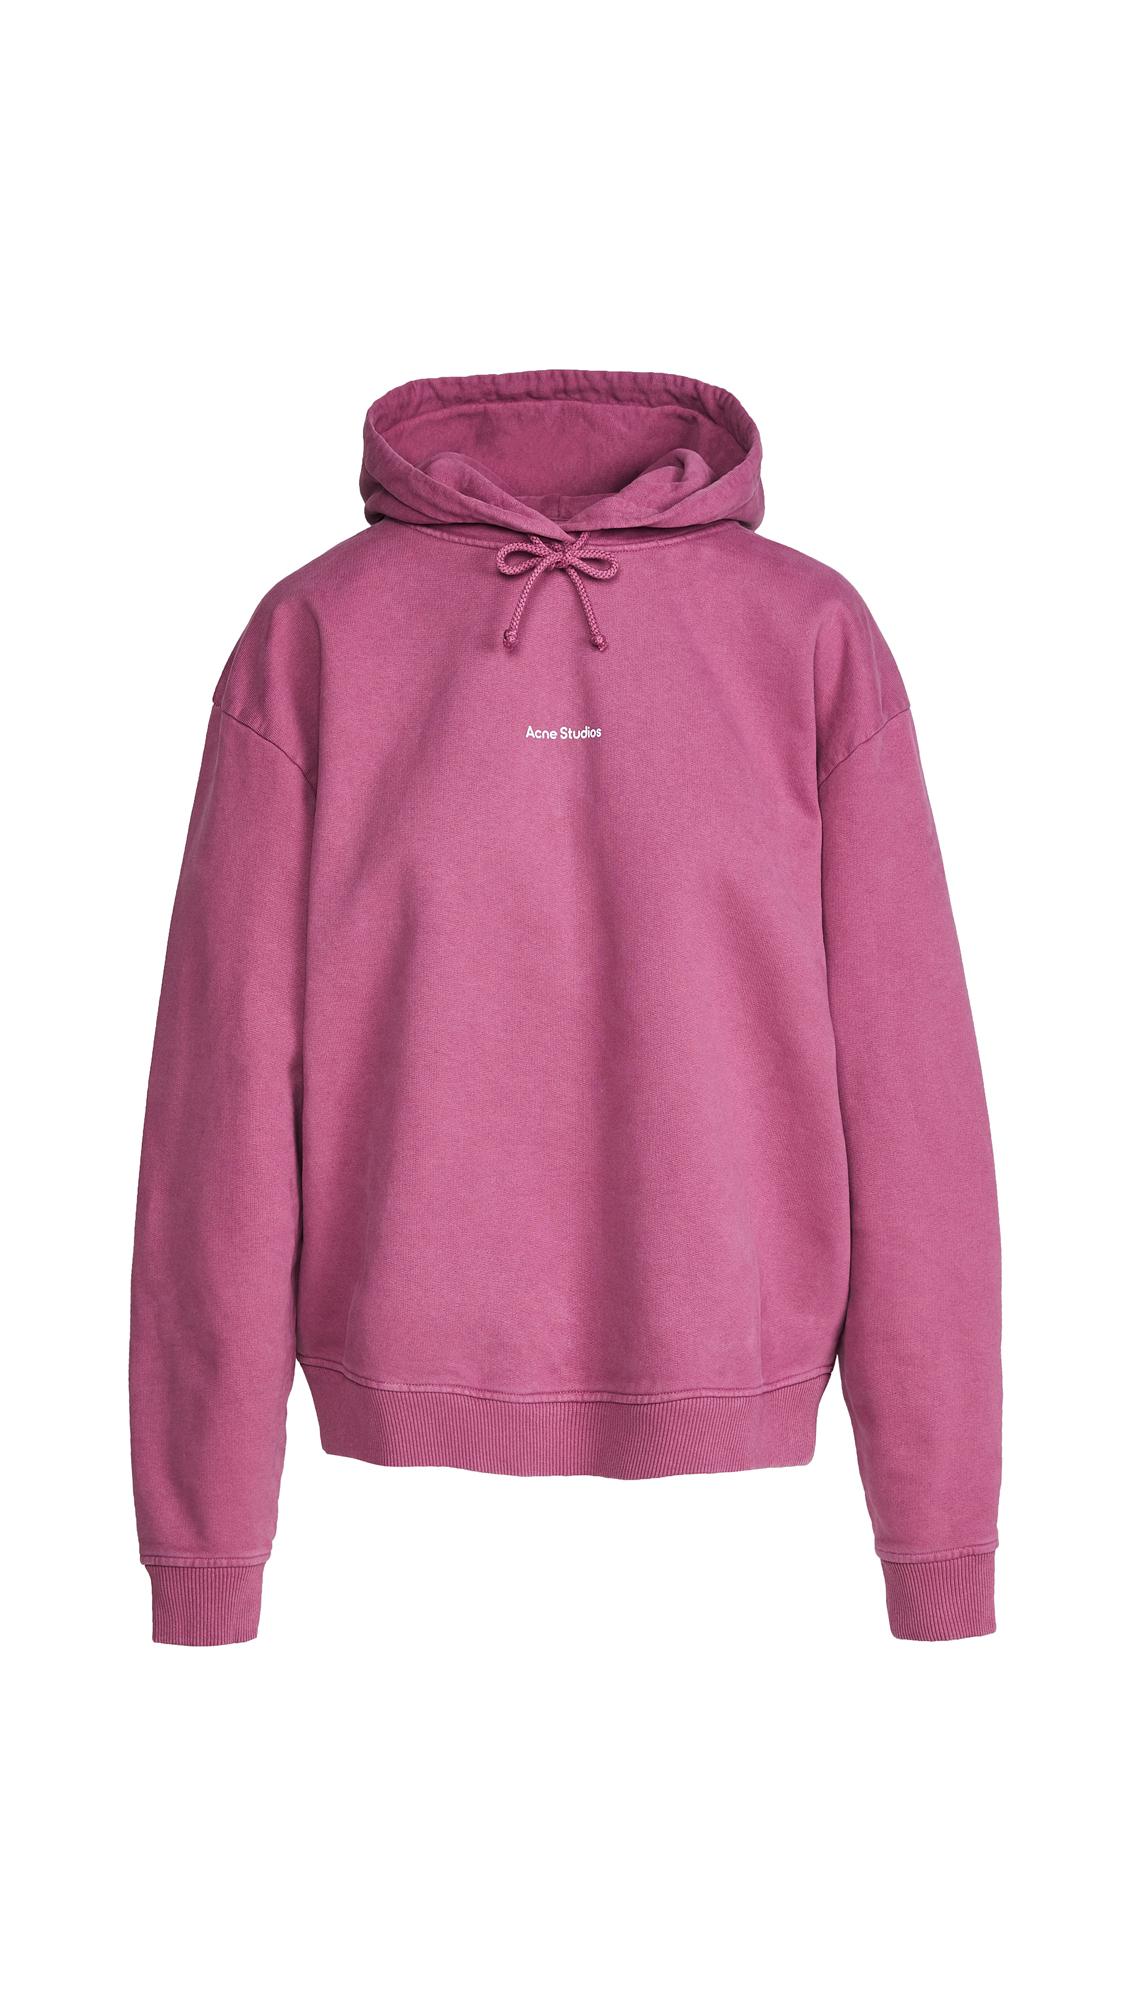 Acne Studios Feirdra Stamp Sweatshirt